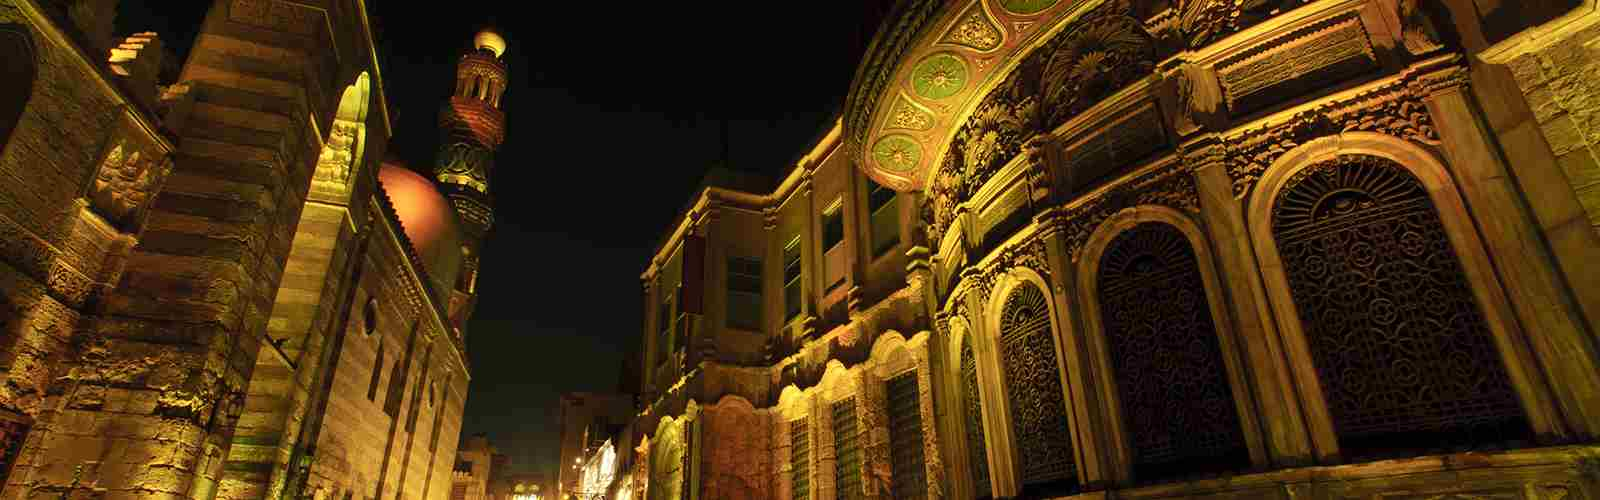 Khan El Khalili the oldest market in Egypt